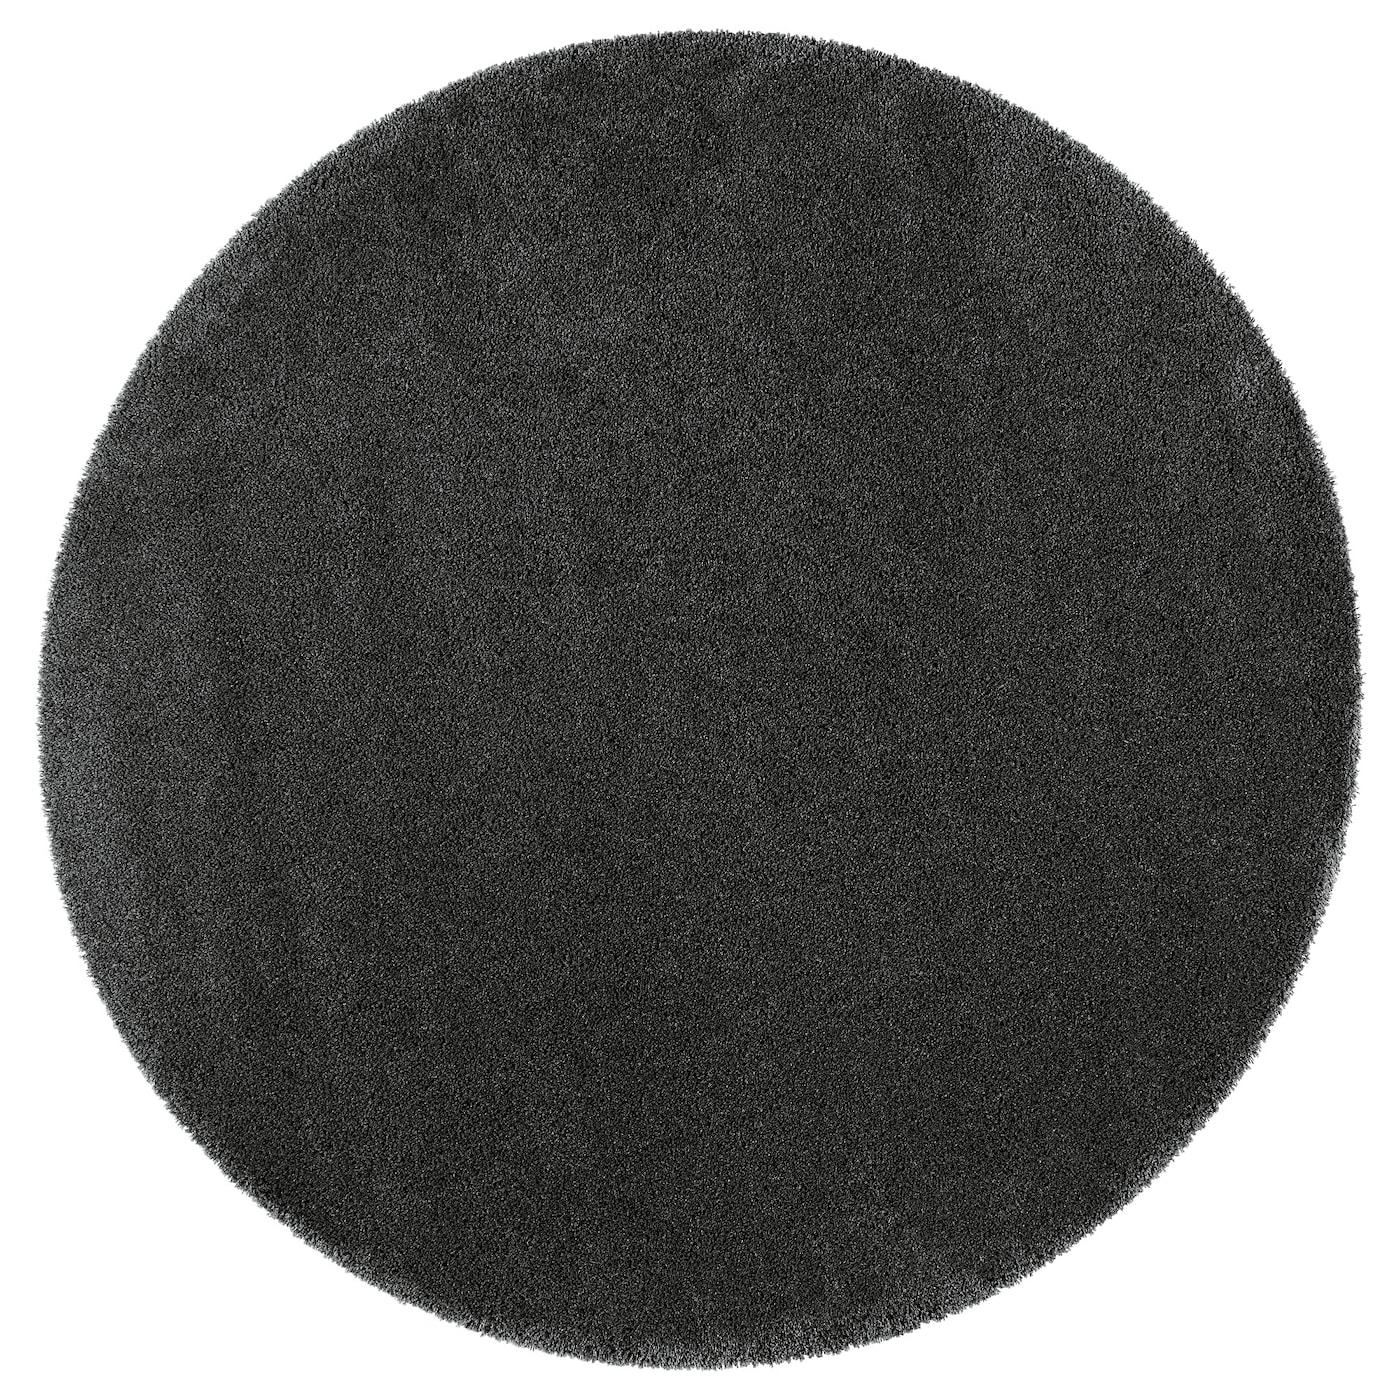 teppich langflor grau best teppich ikea grau ikea teppiche produkte jetzt ab uac with teppich. Black Bedroom Furniture Sets. Home Design Ideas